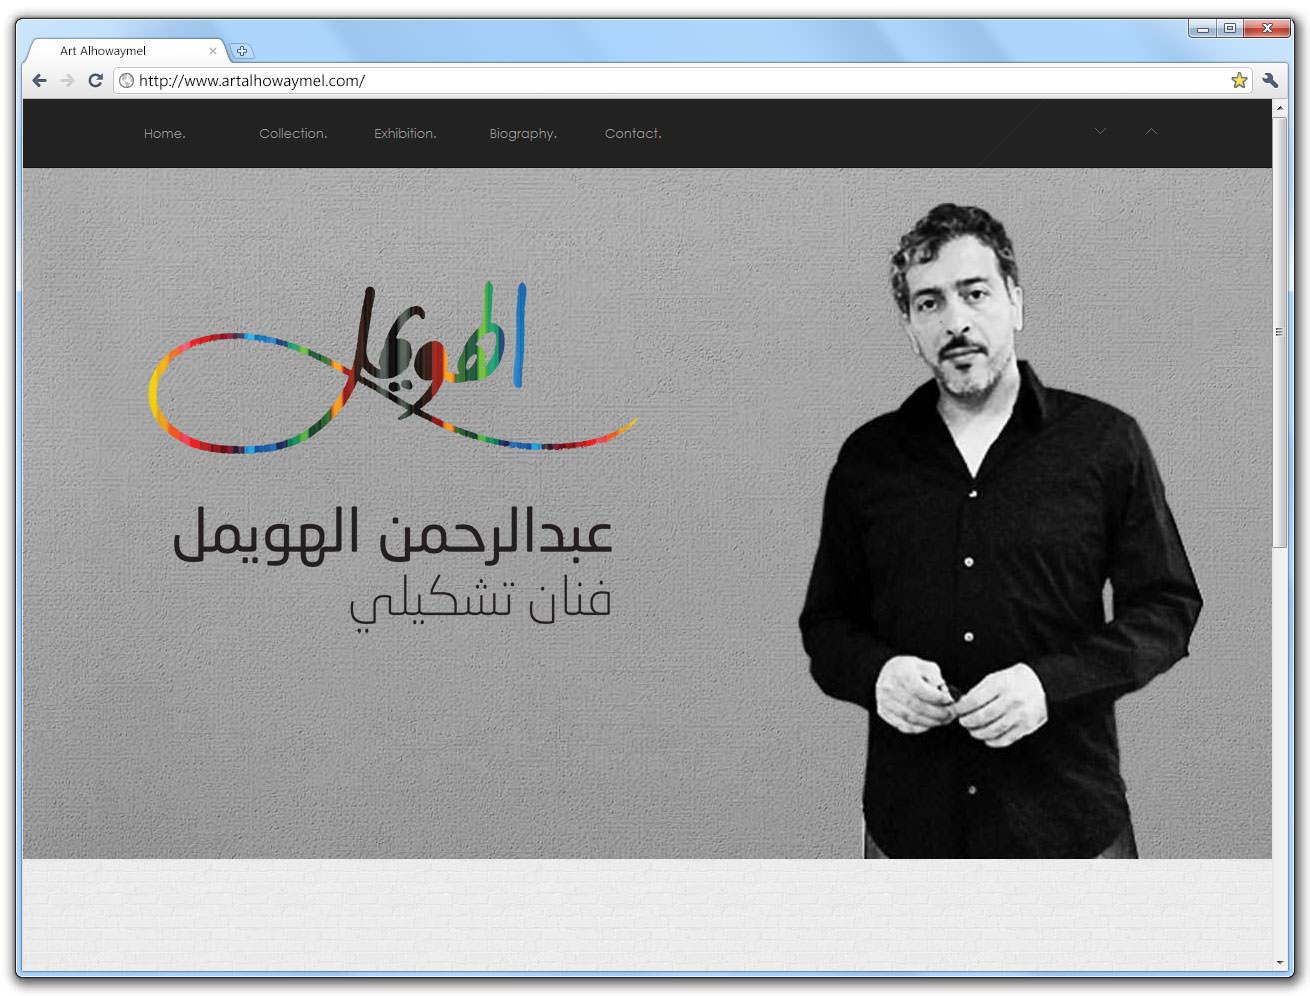 art-alhowaymel-website